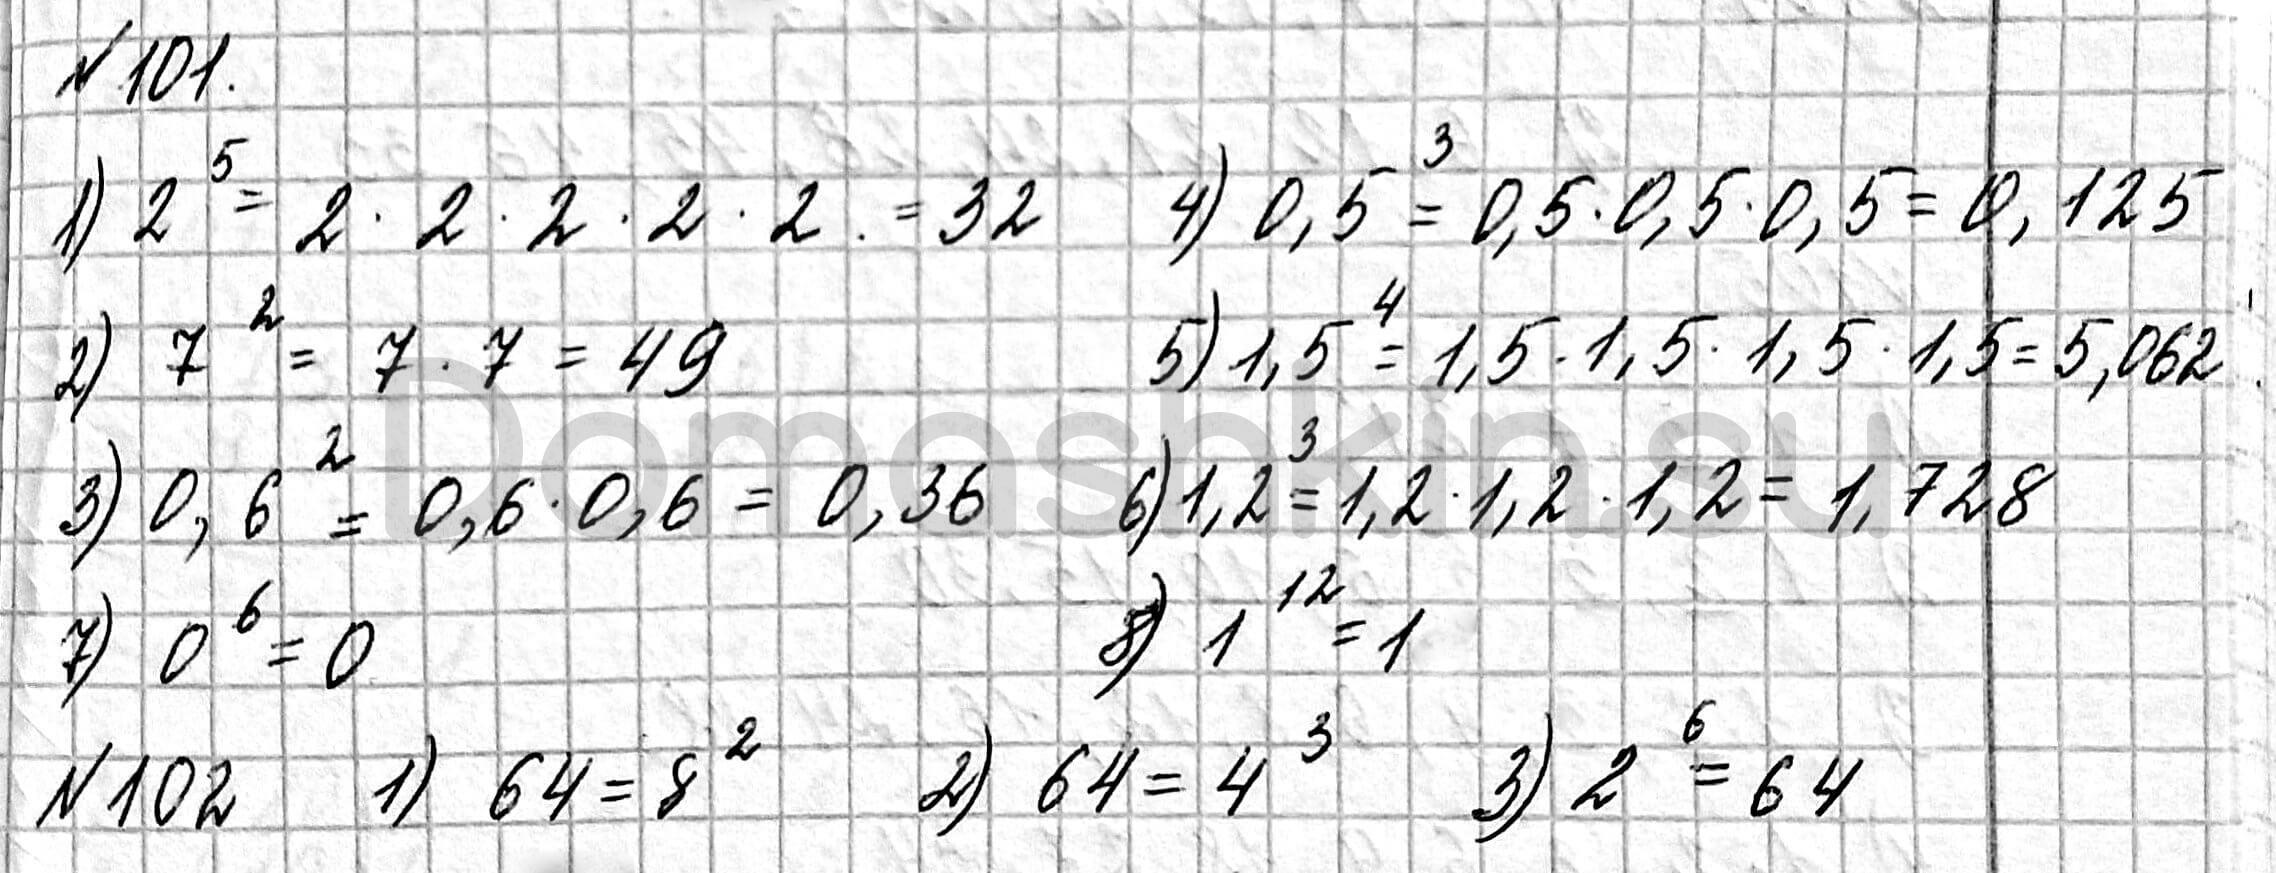 Математика 6 класс учебник Мерзляк номер 101 решение